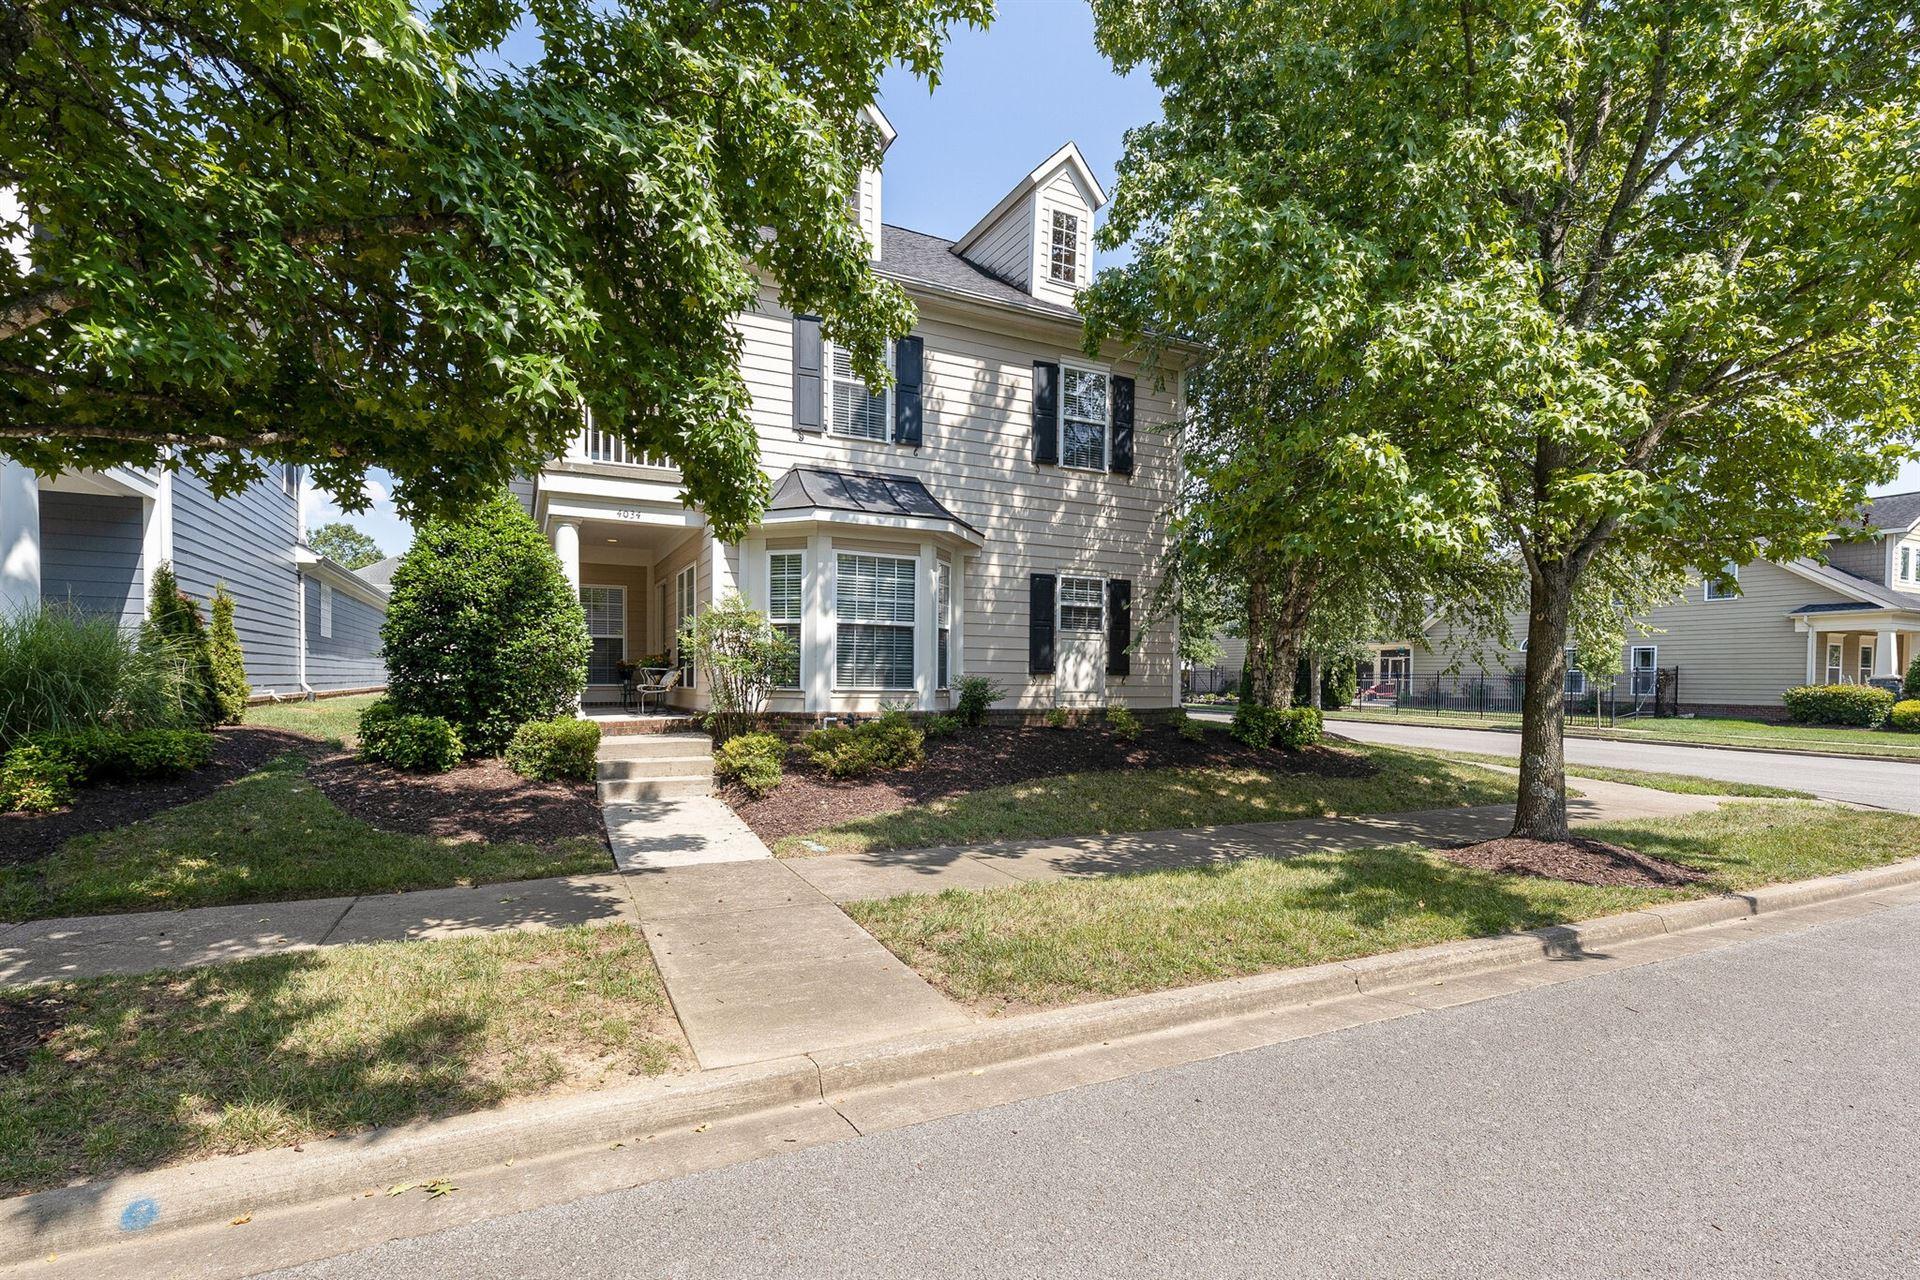 Photo of 4034 St Andrews Ln, Spring Hill, TN 37174 (MLS # 2276799)